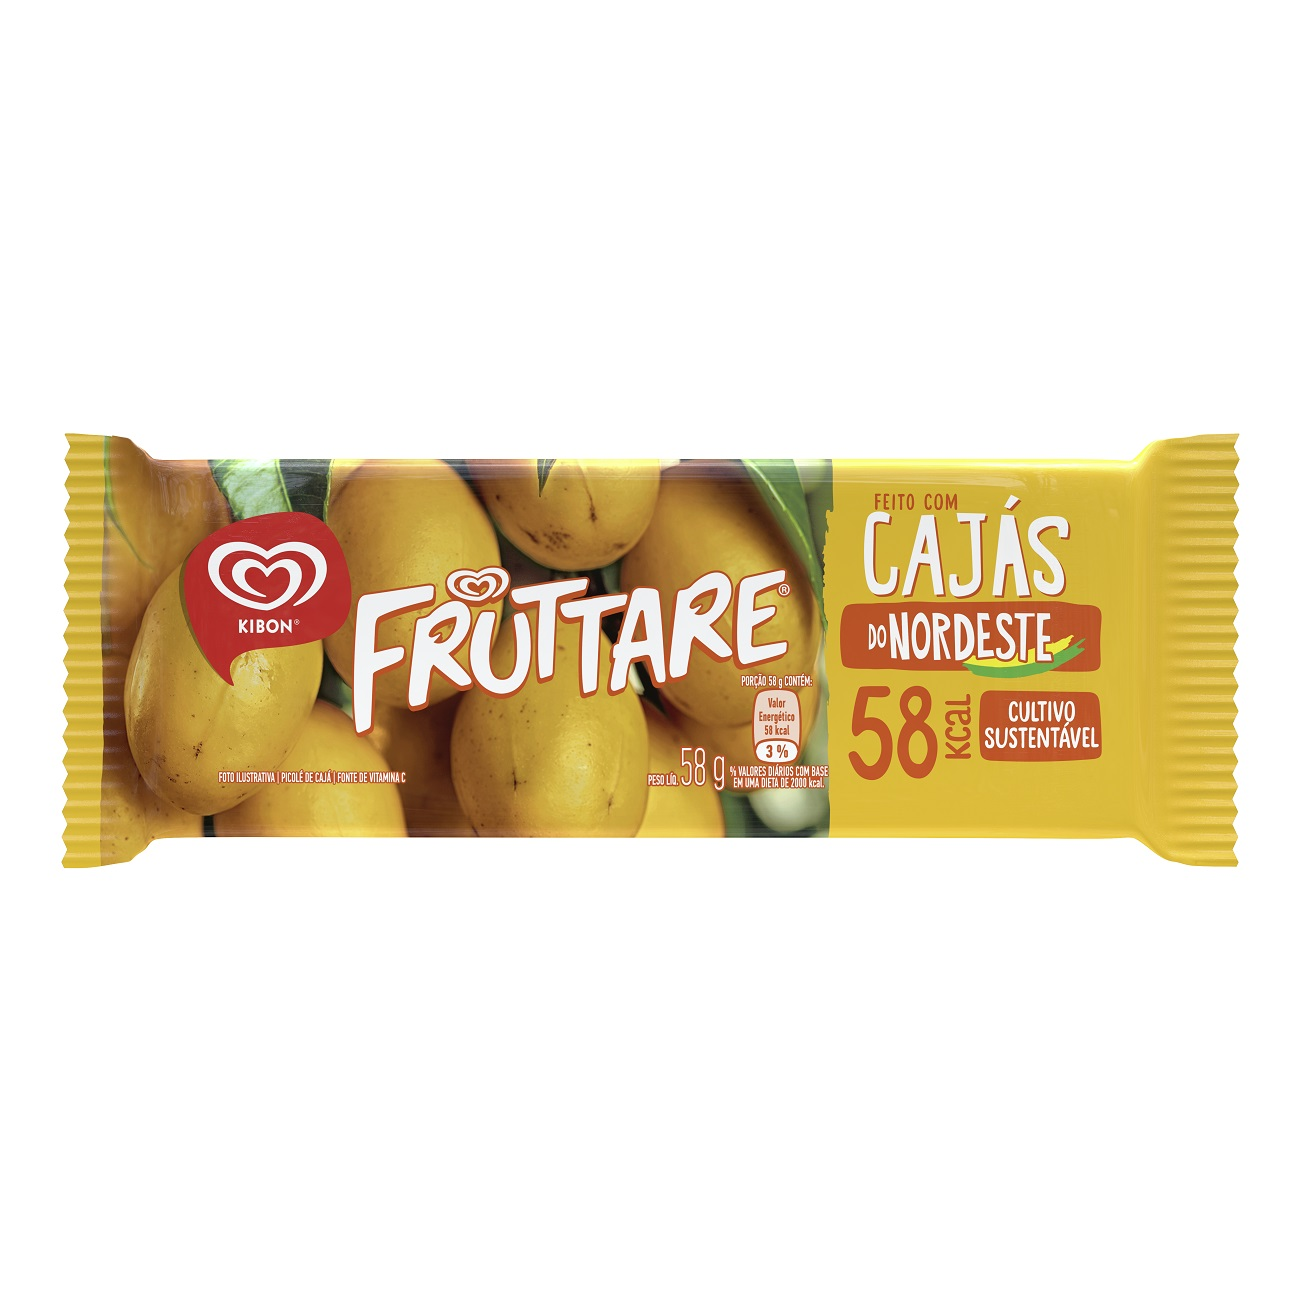 Sorvete Kibon Fruttare Palito Caja 60ML | Caixa com 28